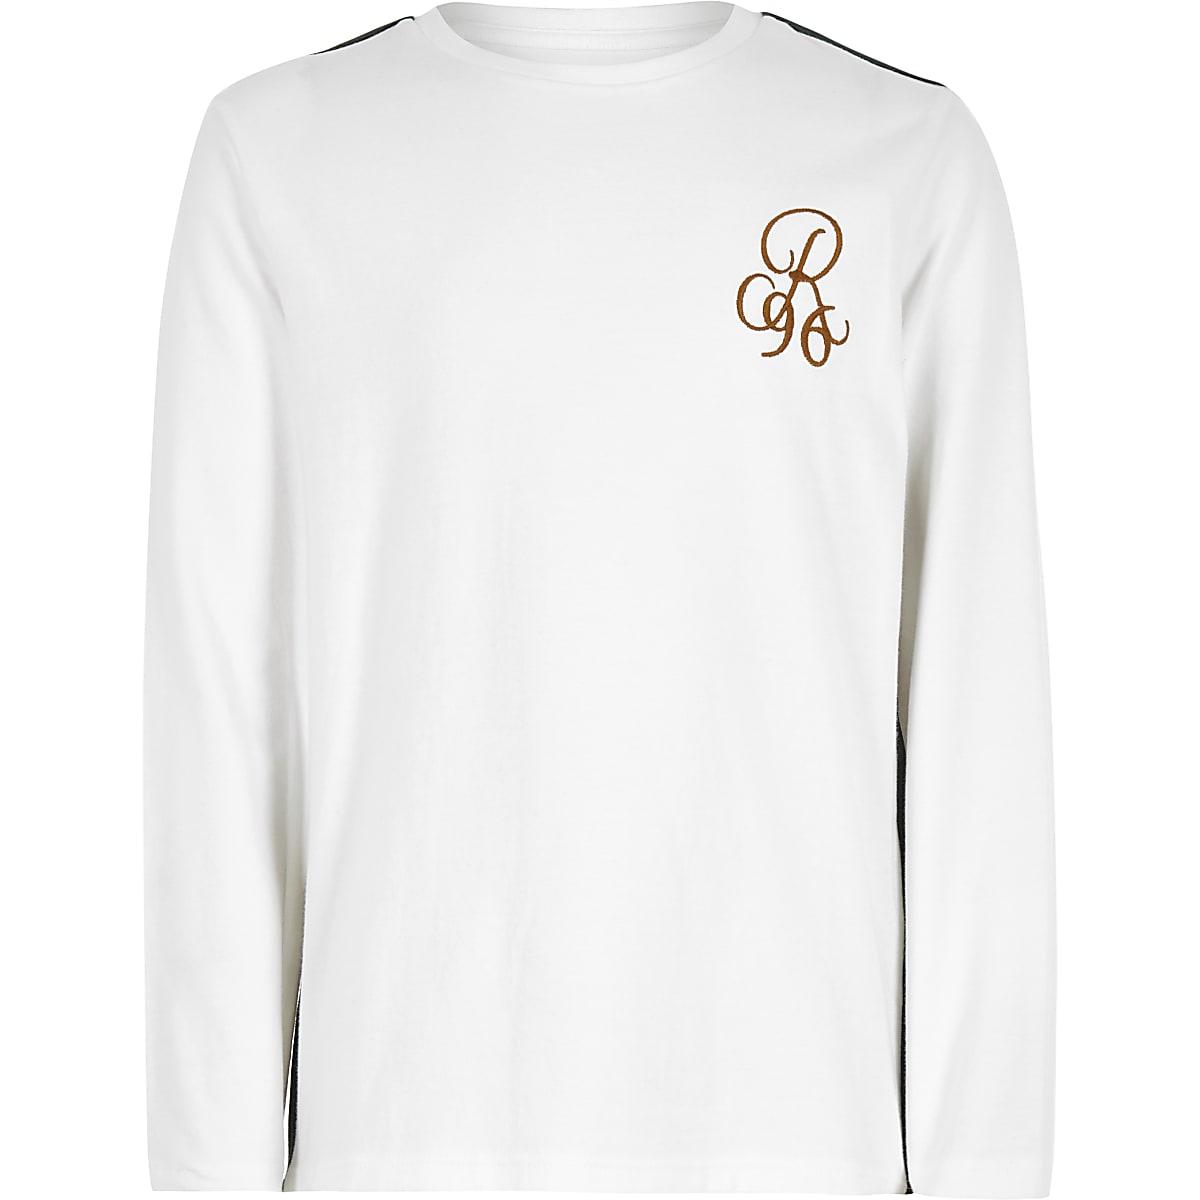 Boys white 'R96' tape long sleeve T-shirt